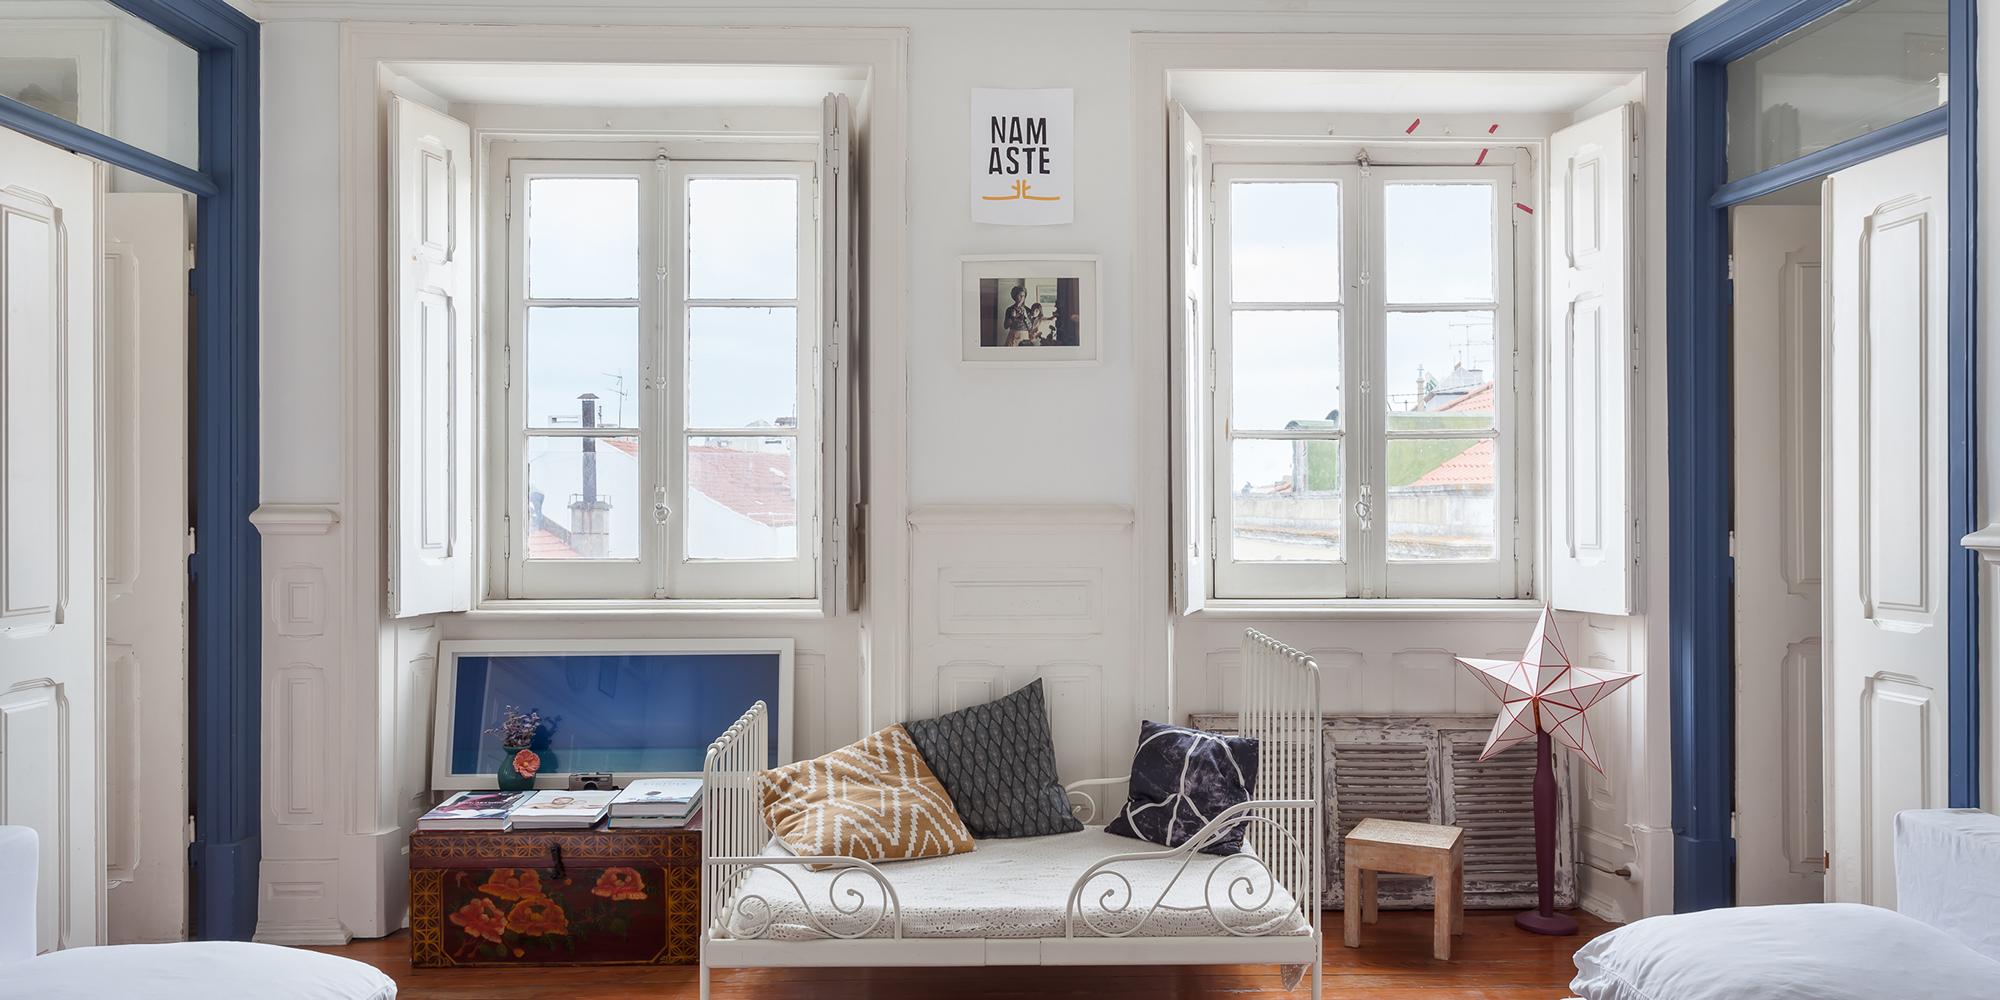 Photo Agency Historias de Casa - Editorial Interior Design Features